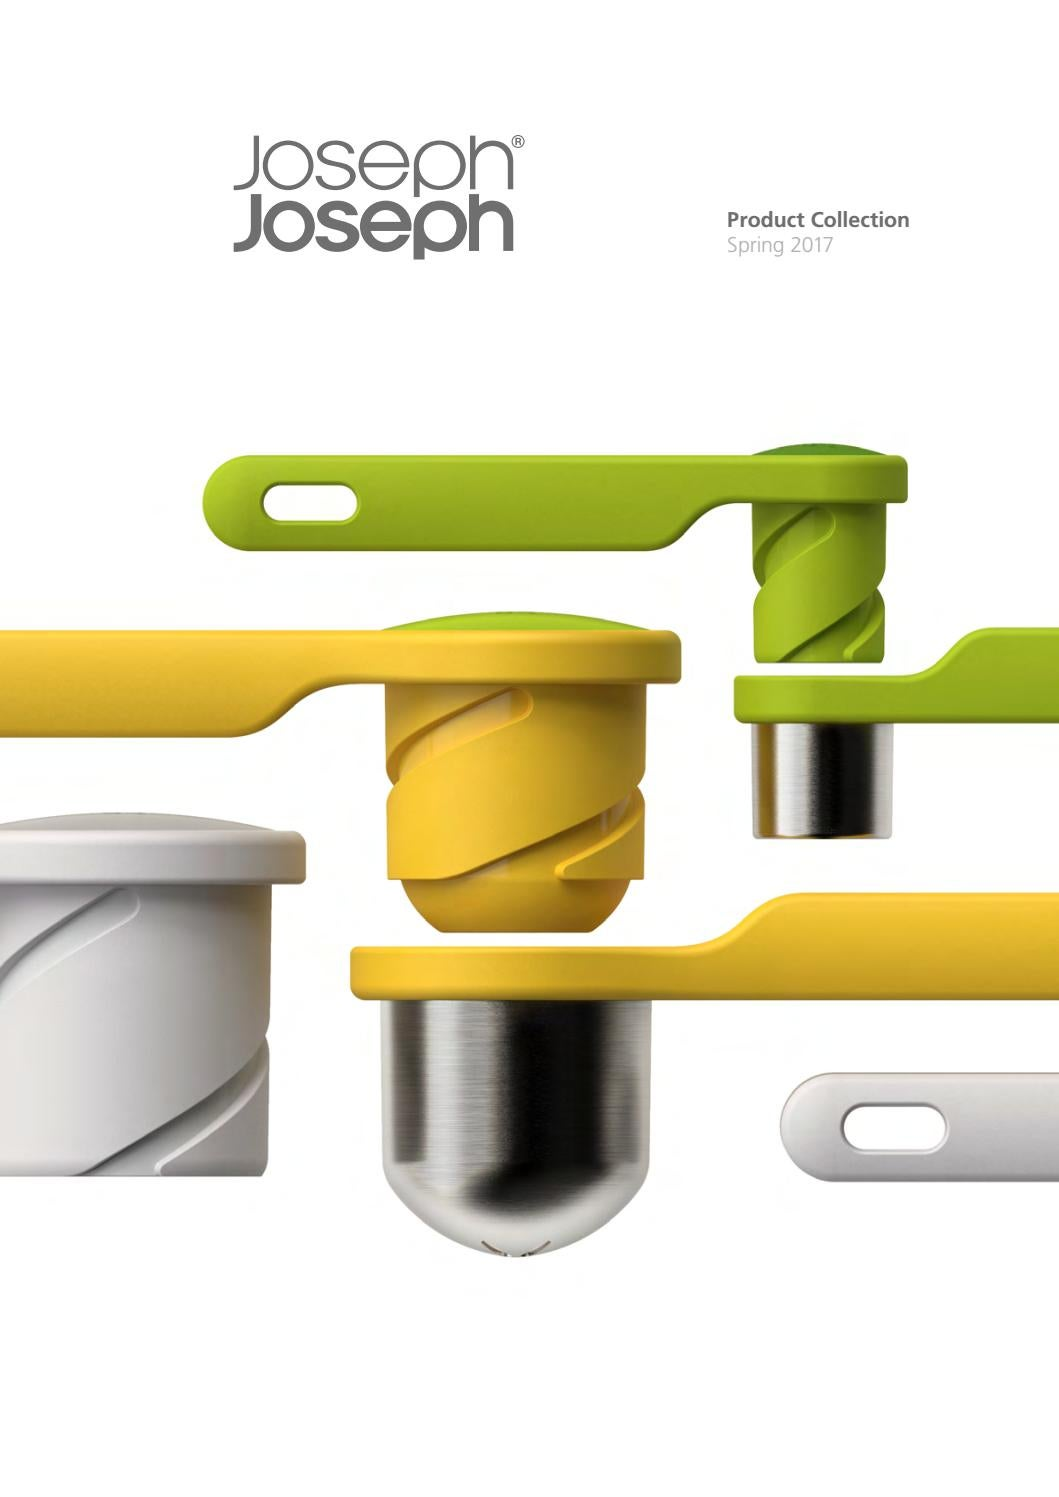 Josephjoseph Catalogue 2017 By Mas Design Products Ltd Issuu